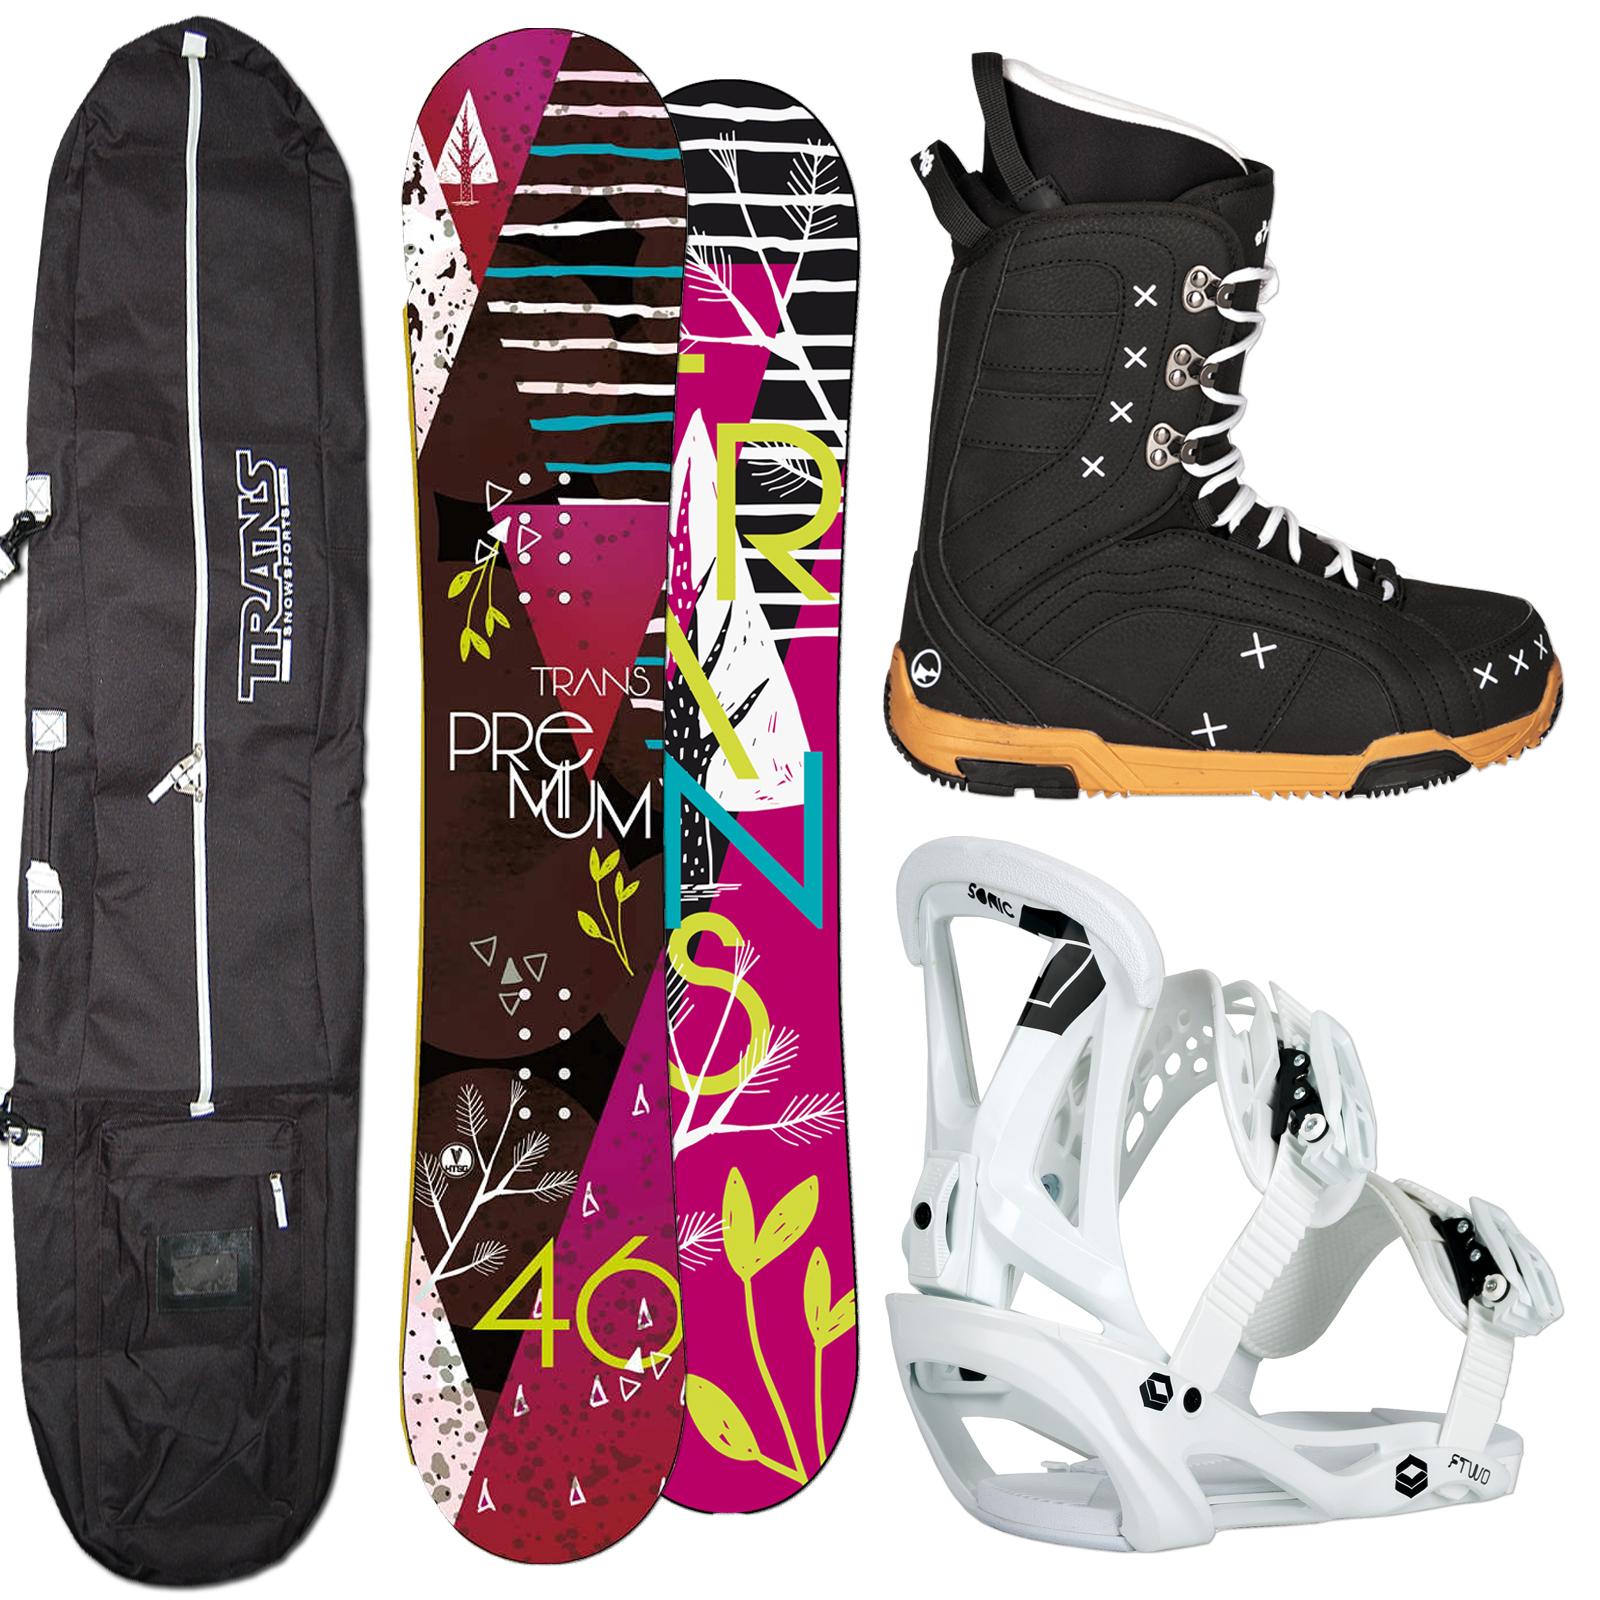 DAMEN SNOWBOARD TRANS PREMIUM 144 CM BERRY + SONIC BINDUNG GR. M + BOOTS + BAG